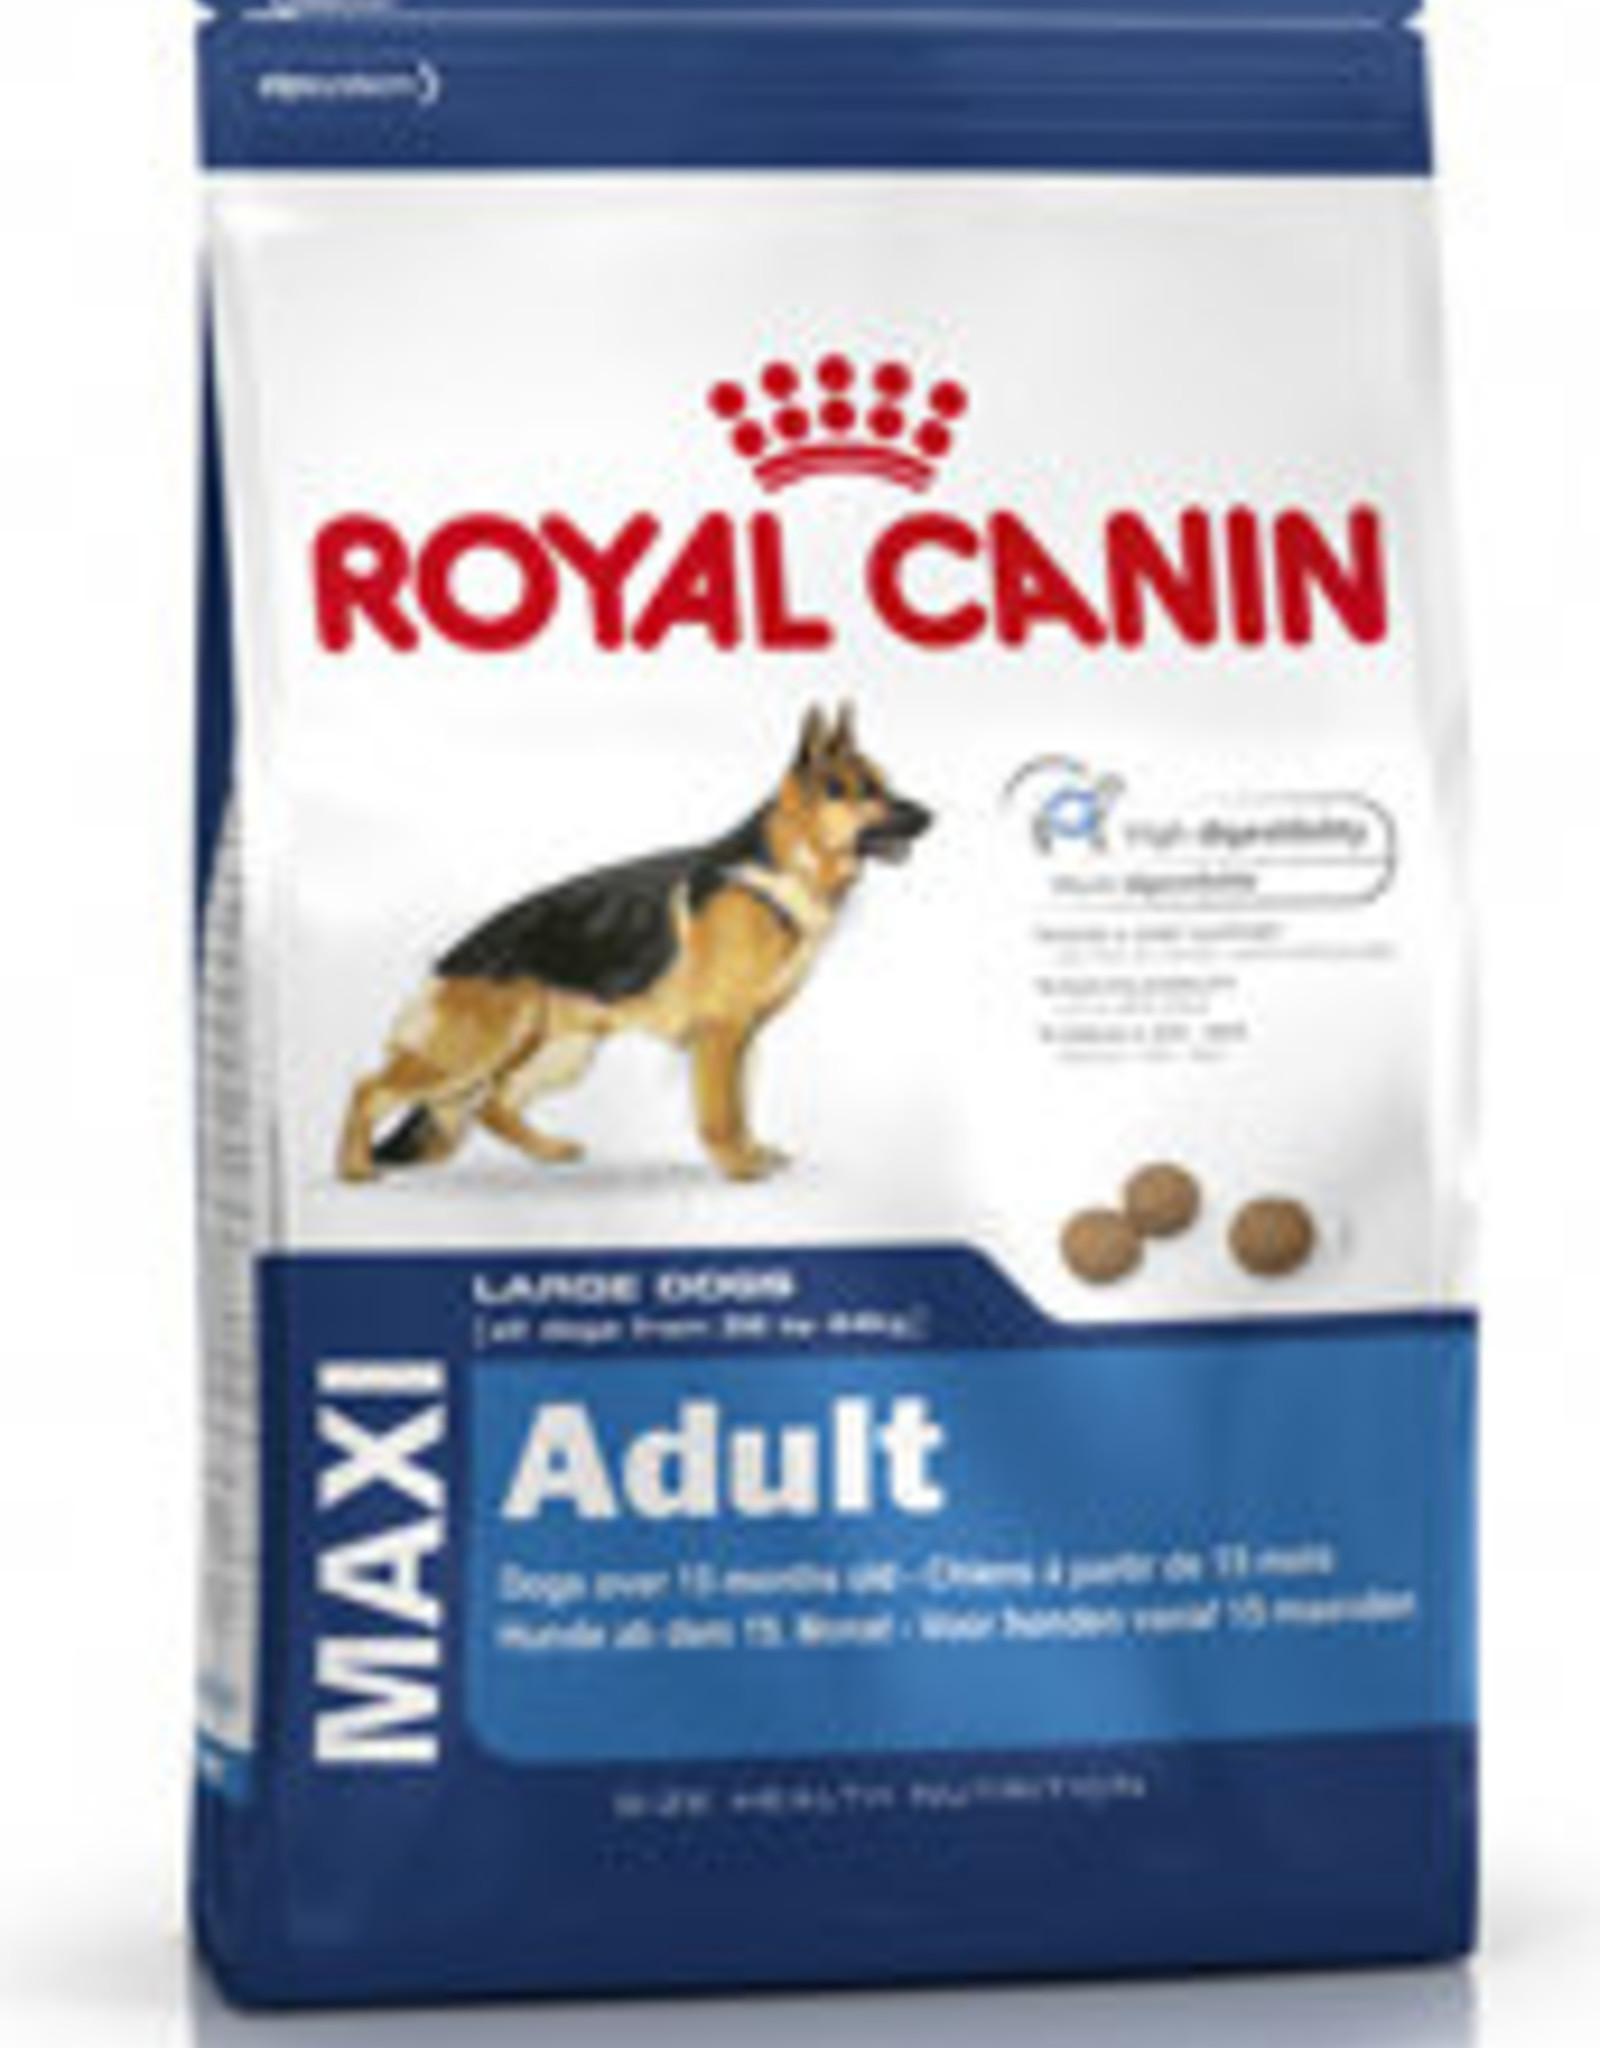 Royal Canin Royal Canin Shn Maxi Adult Chien 15kg